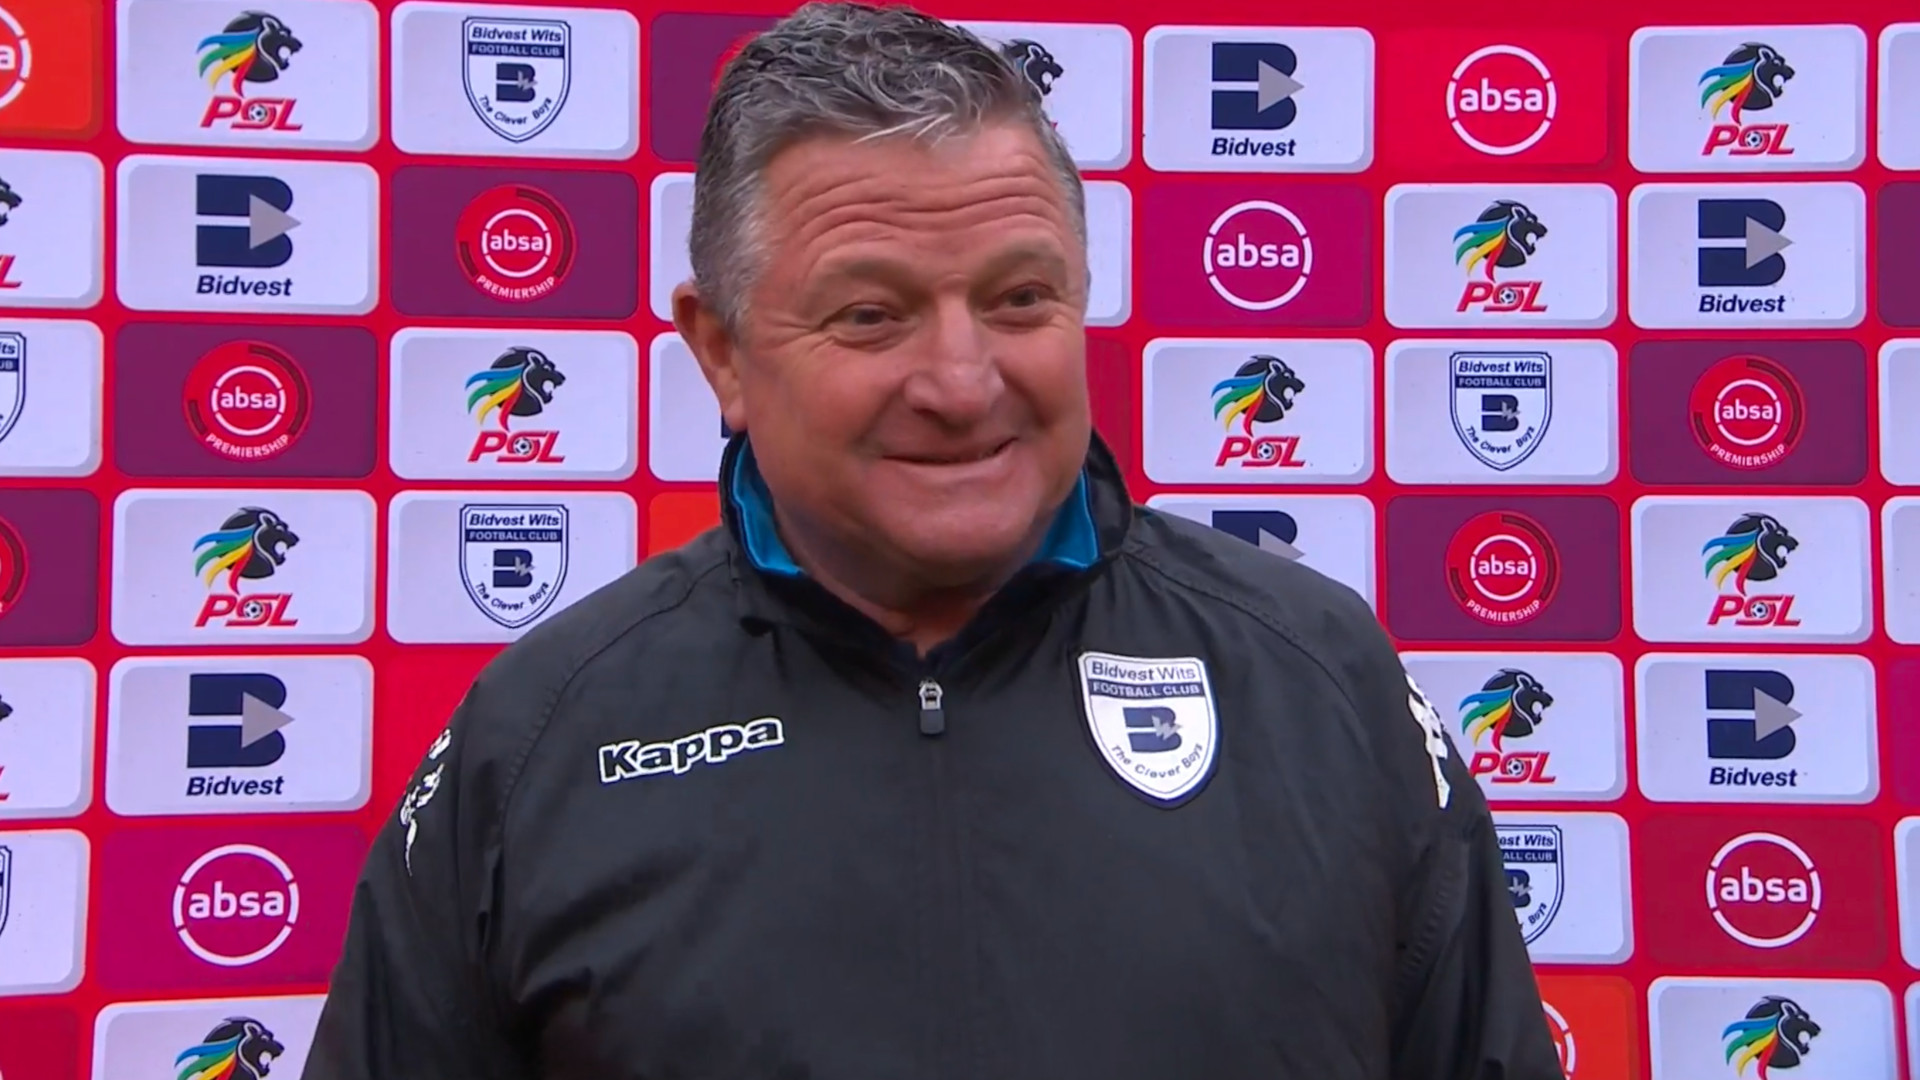 Absa Premiership 2019/20 | Absa Premiership | Bidvest Wits and Golden Arrows | Post-match interview with Gavin Hunt